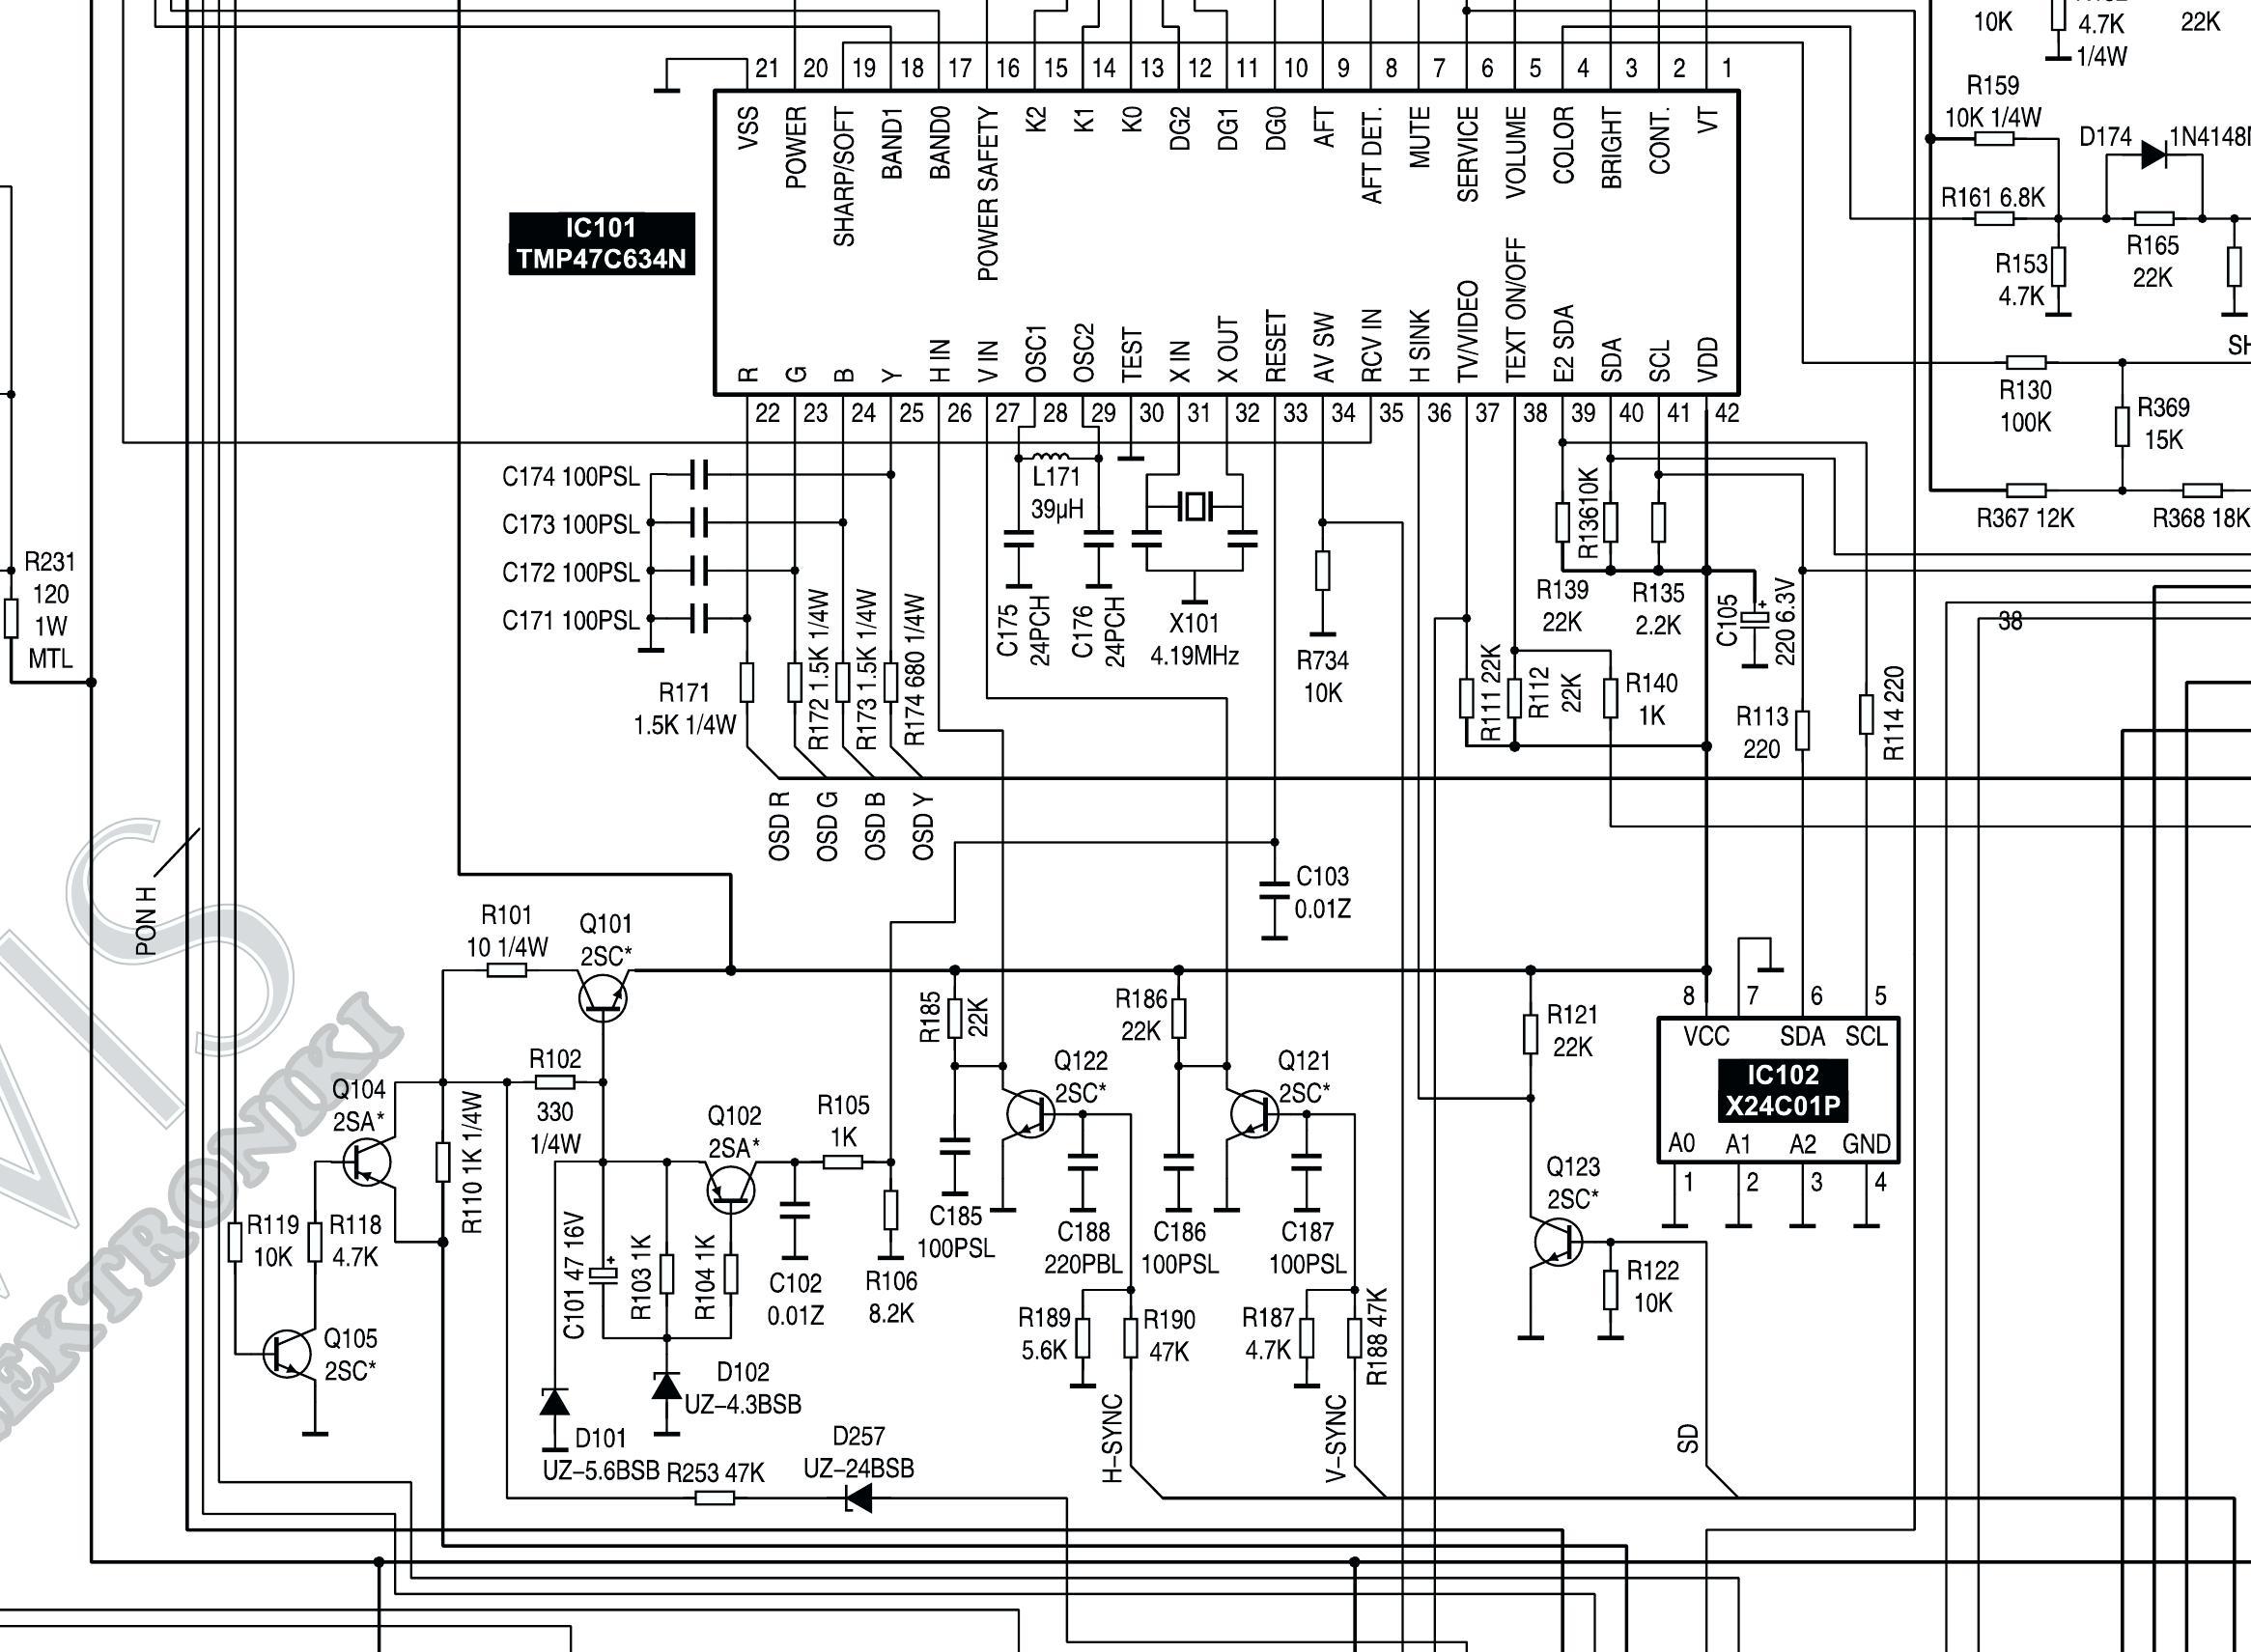 Funai Tv-2000A Mk7 Инструкция По Эксплуатации